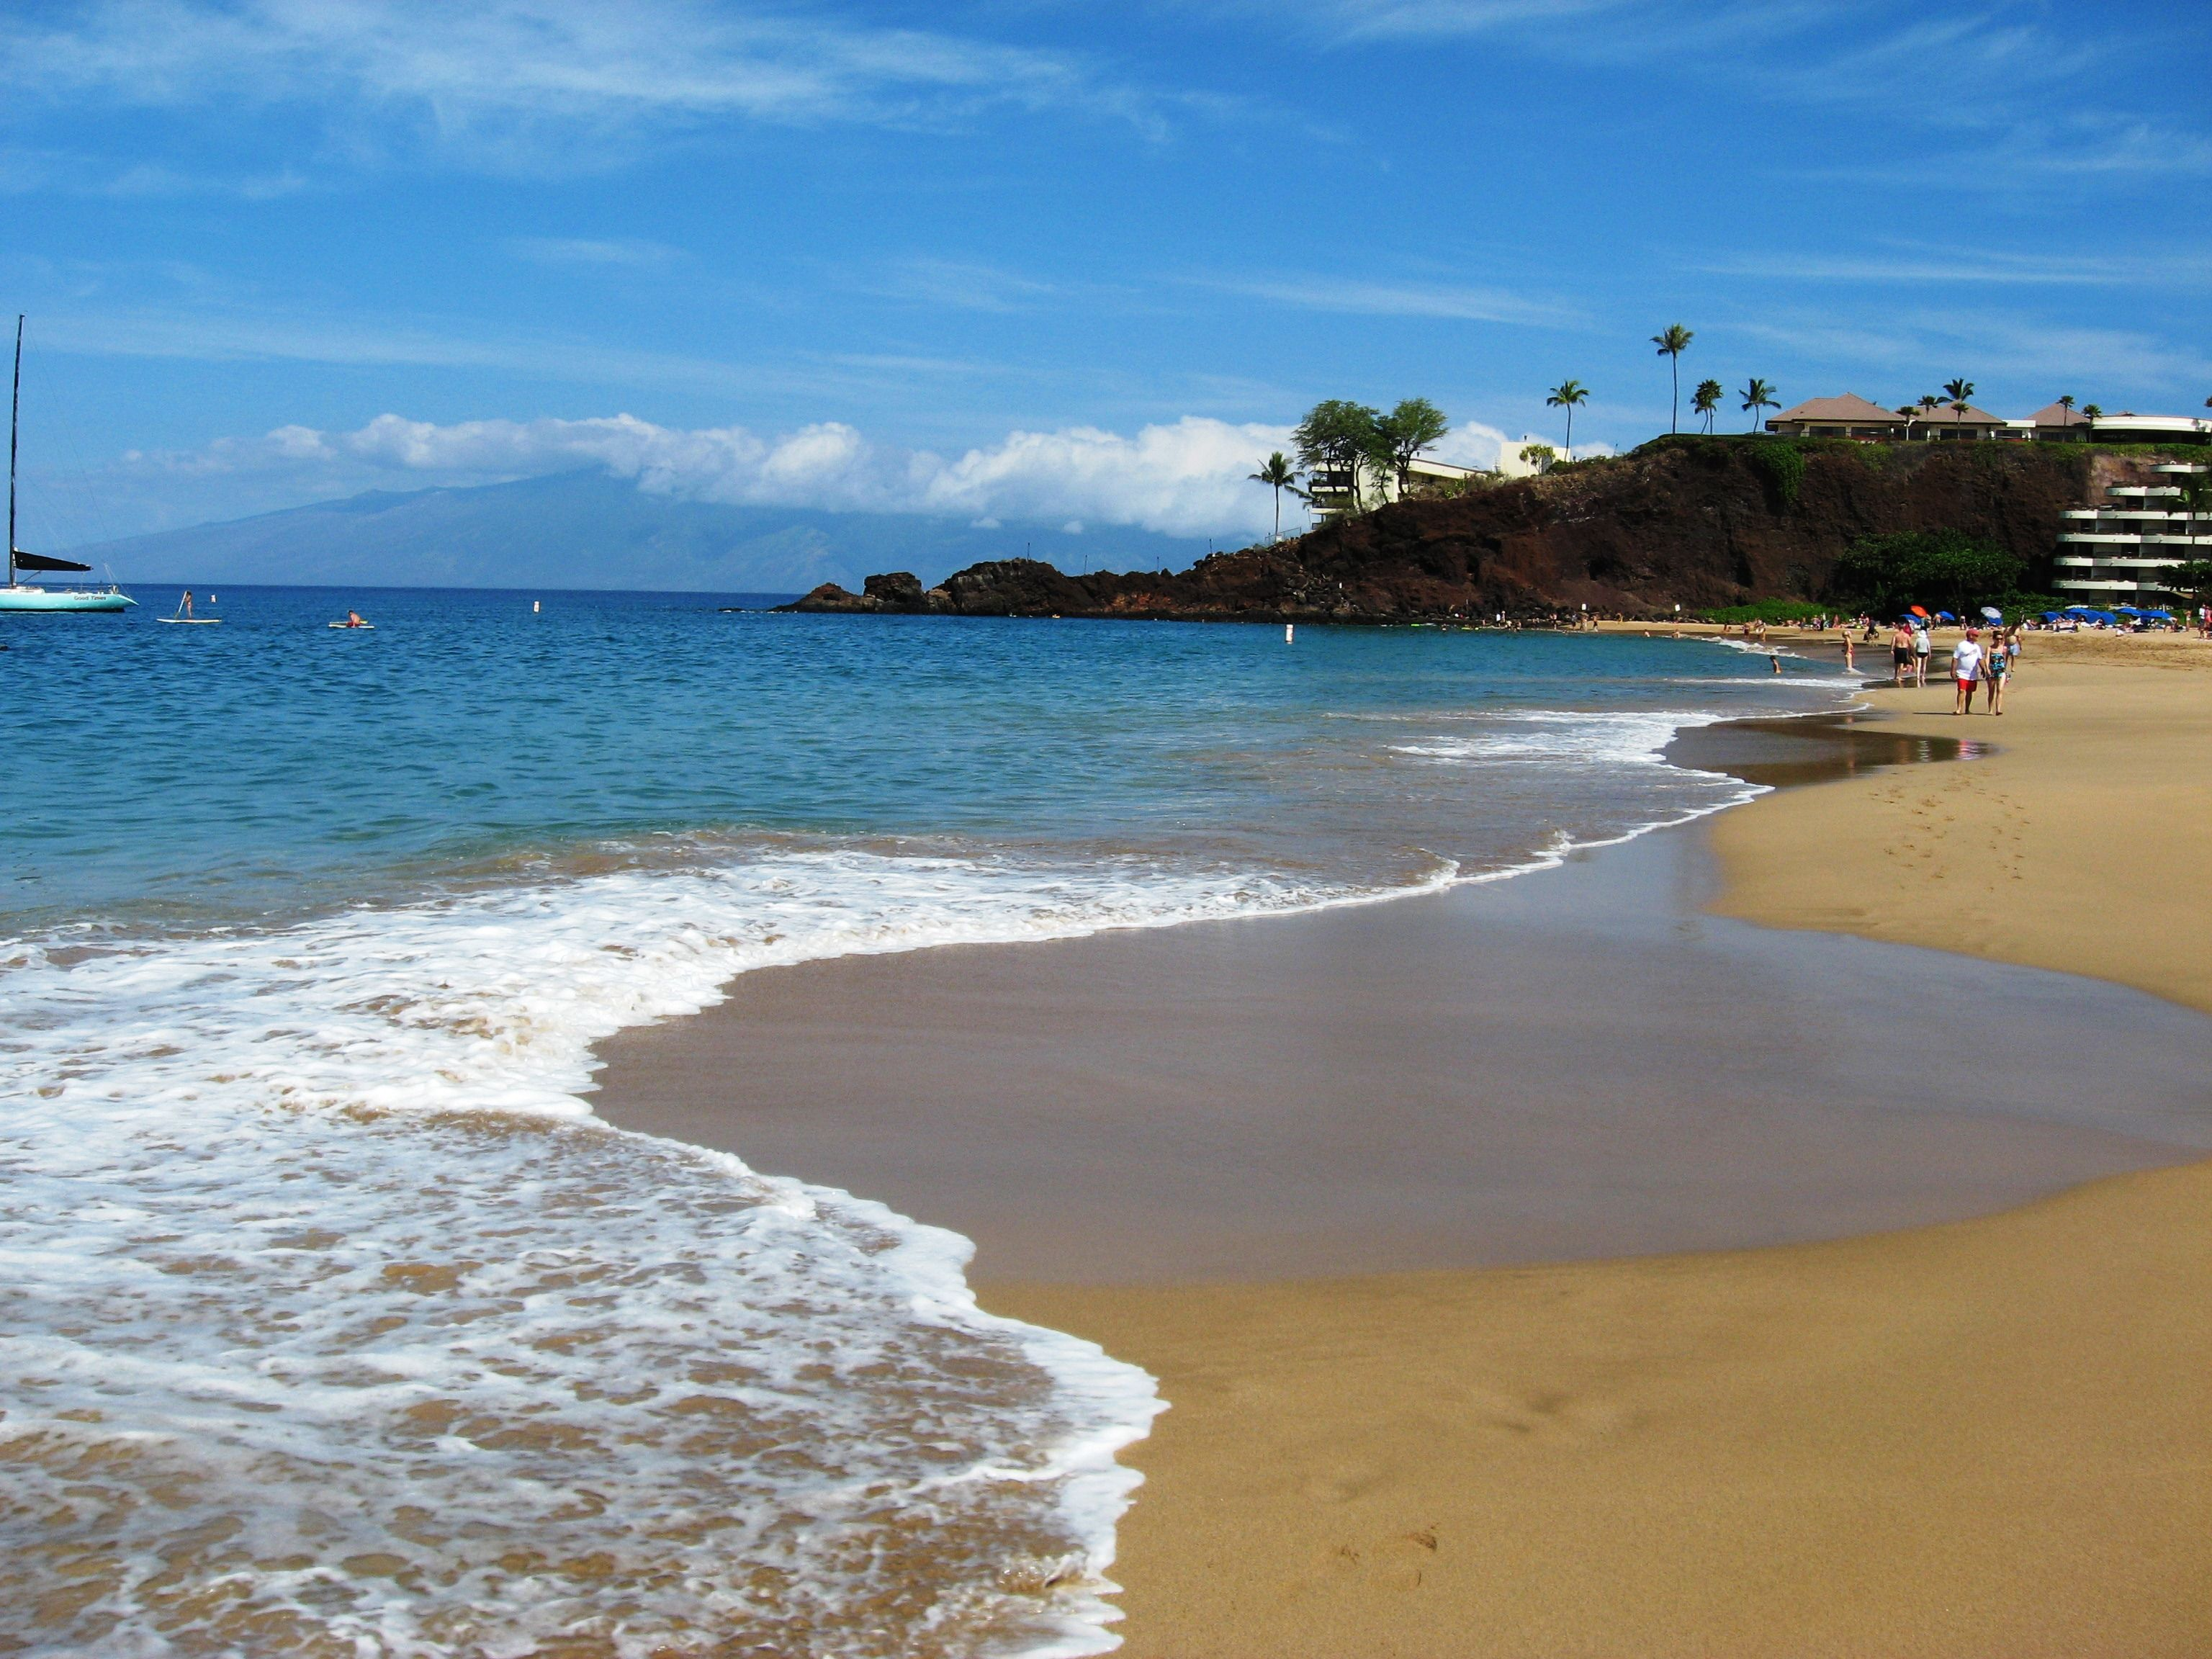 Ka'anapali Beach - my favorite vacation spot